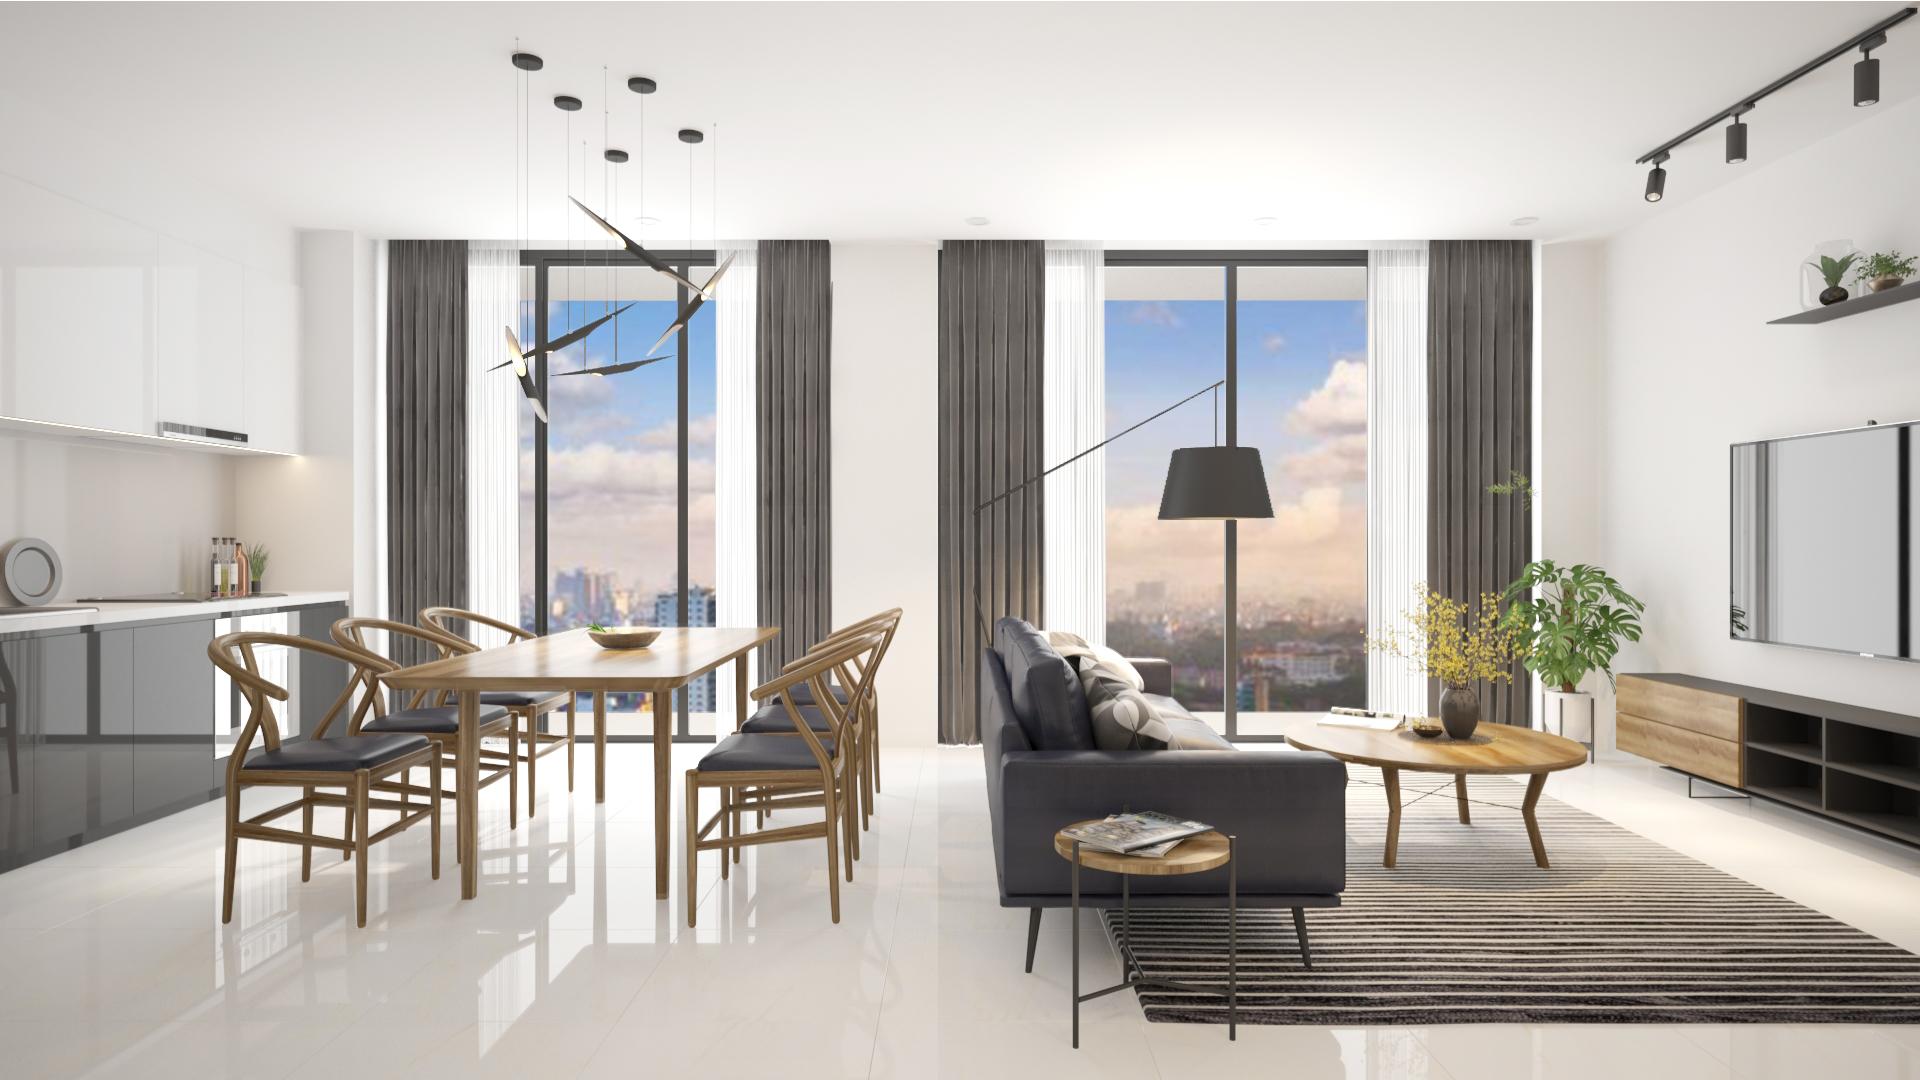 graceinteriors_ananacasa_design_furniture_2_mr_CHOU.jpg